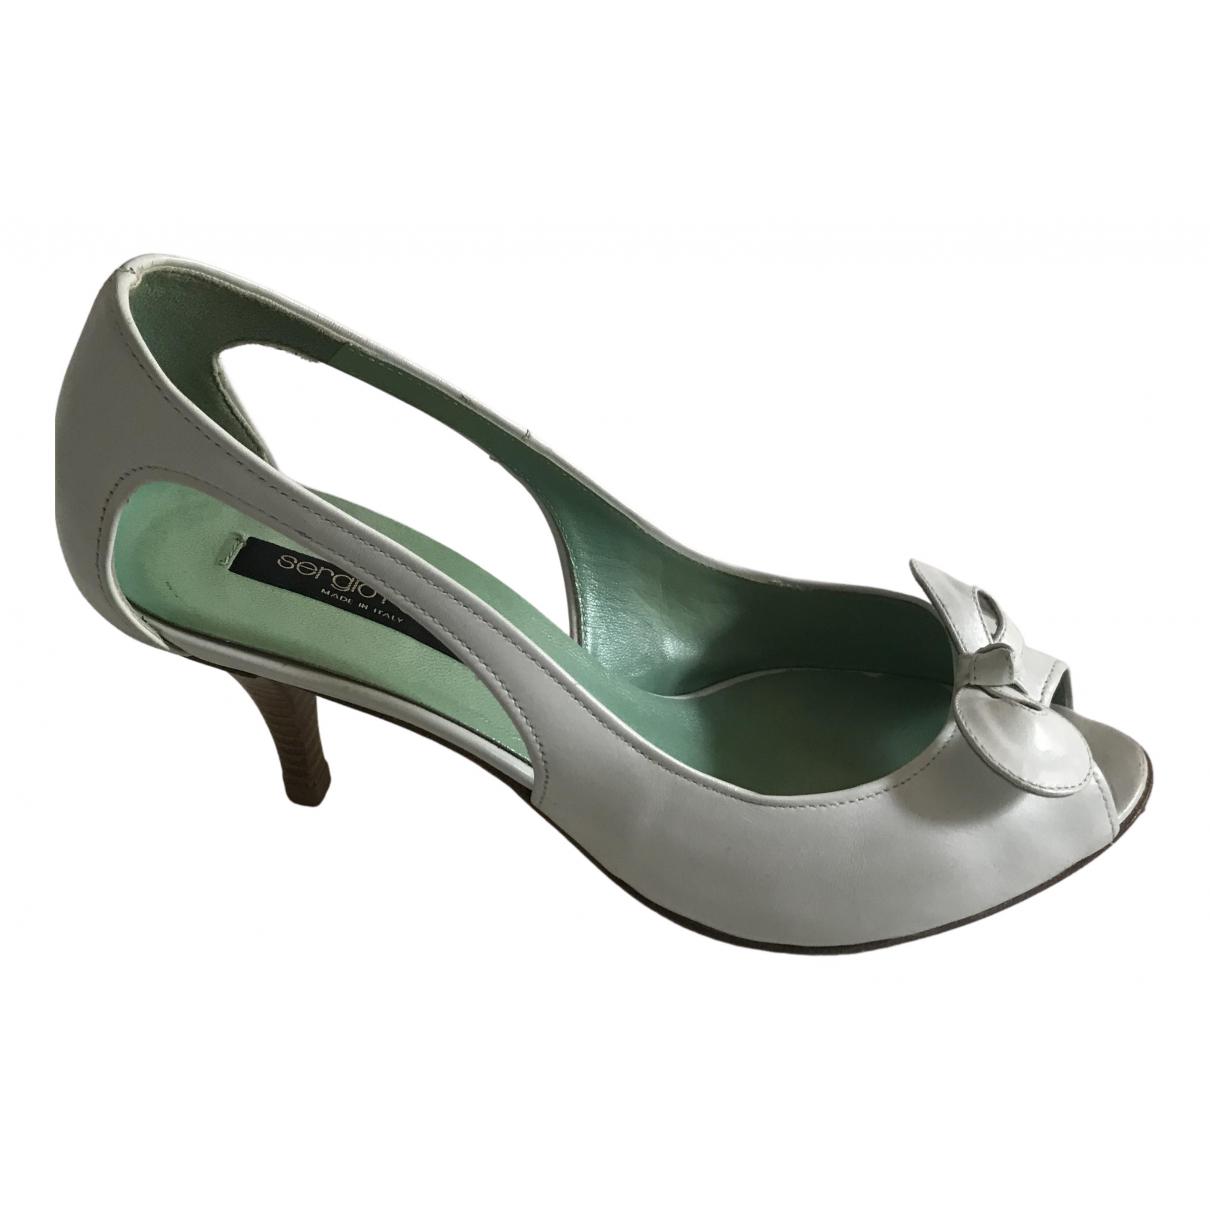 Sergio Rossi N White Leather Heels for Women 37.5 EU